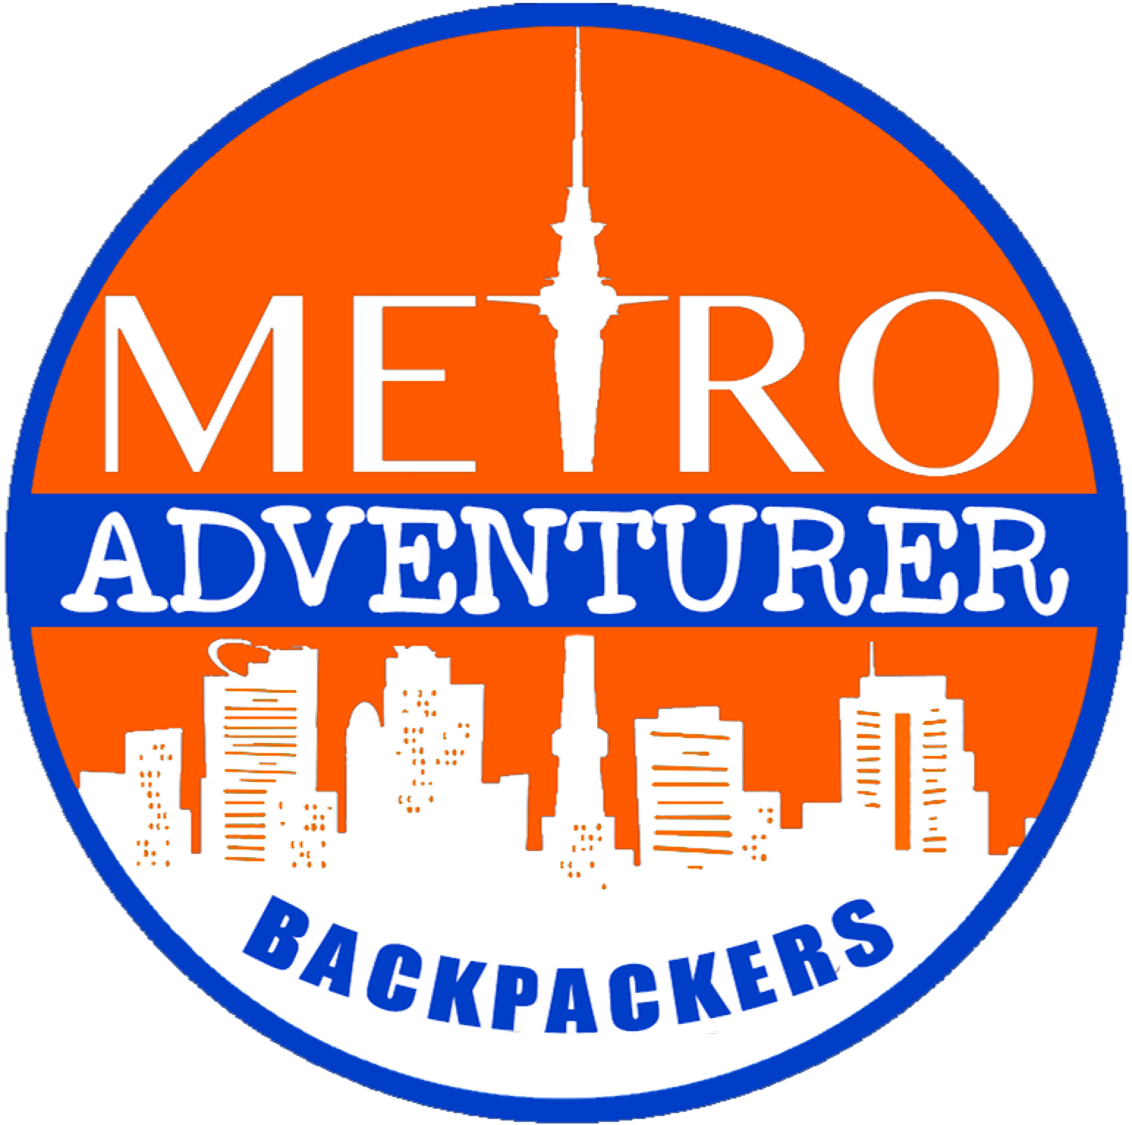 Metro Adventurer